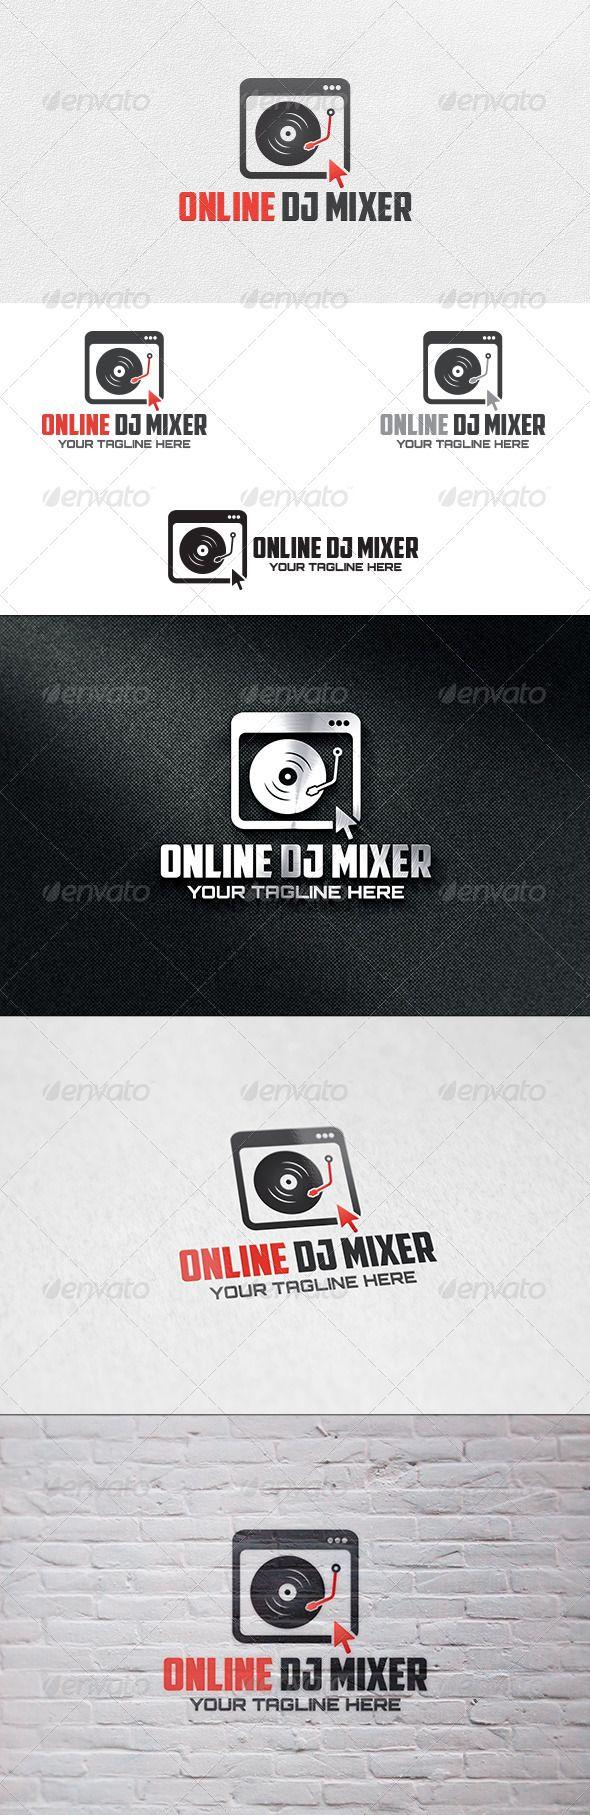 Online DJ Mixer  - Logo Design Template Vector #logotype Download it here: http://graphicriver.net/item/online-dj-mixer-logo-template/6776360?s_rank=965?ref=nexion